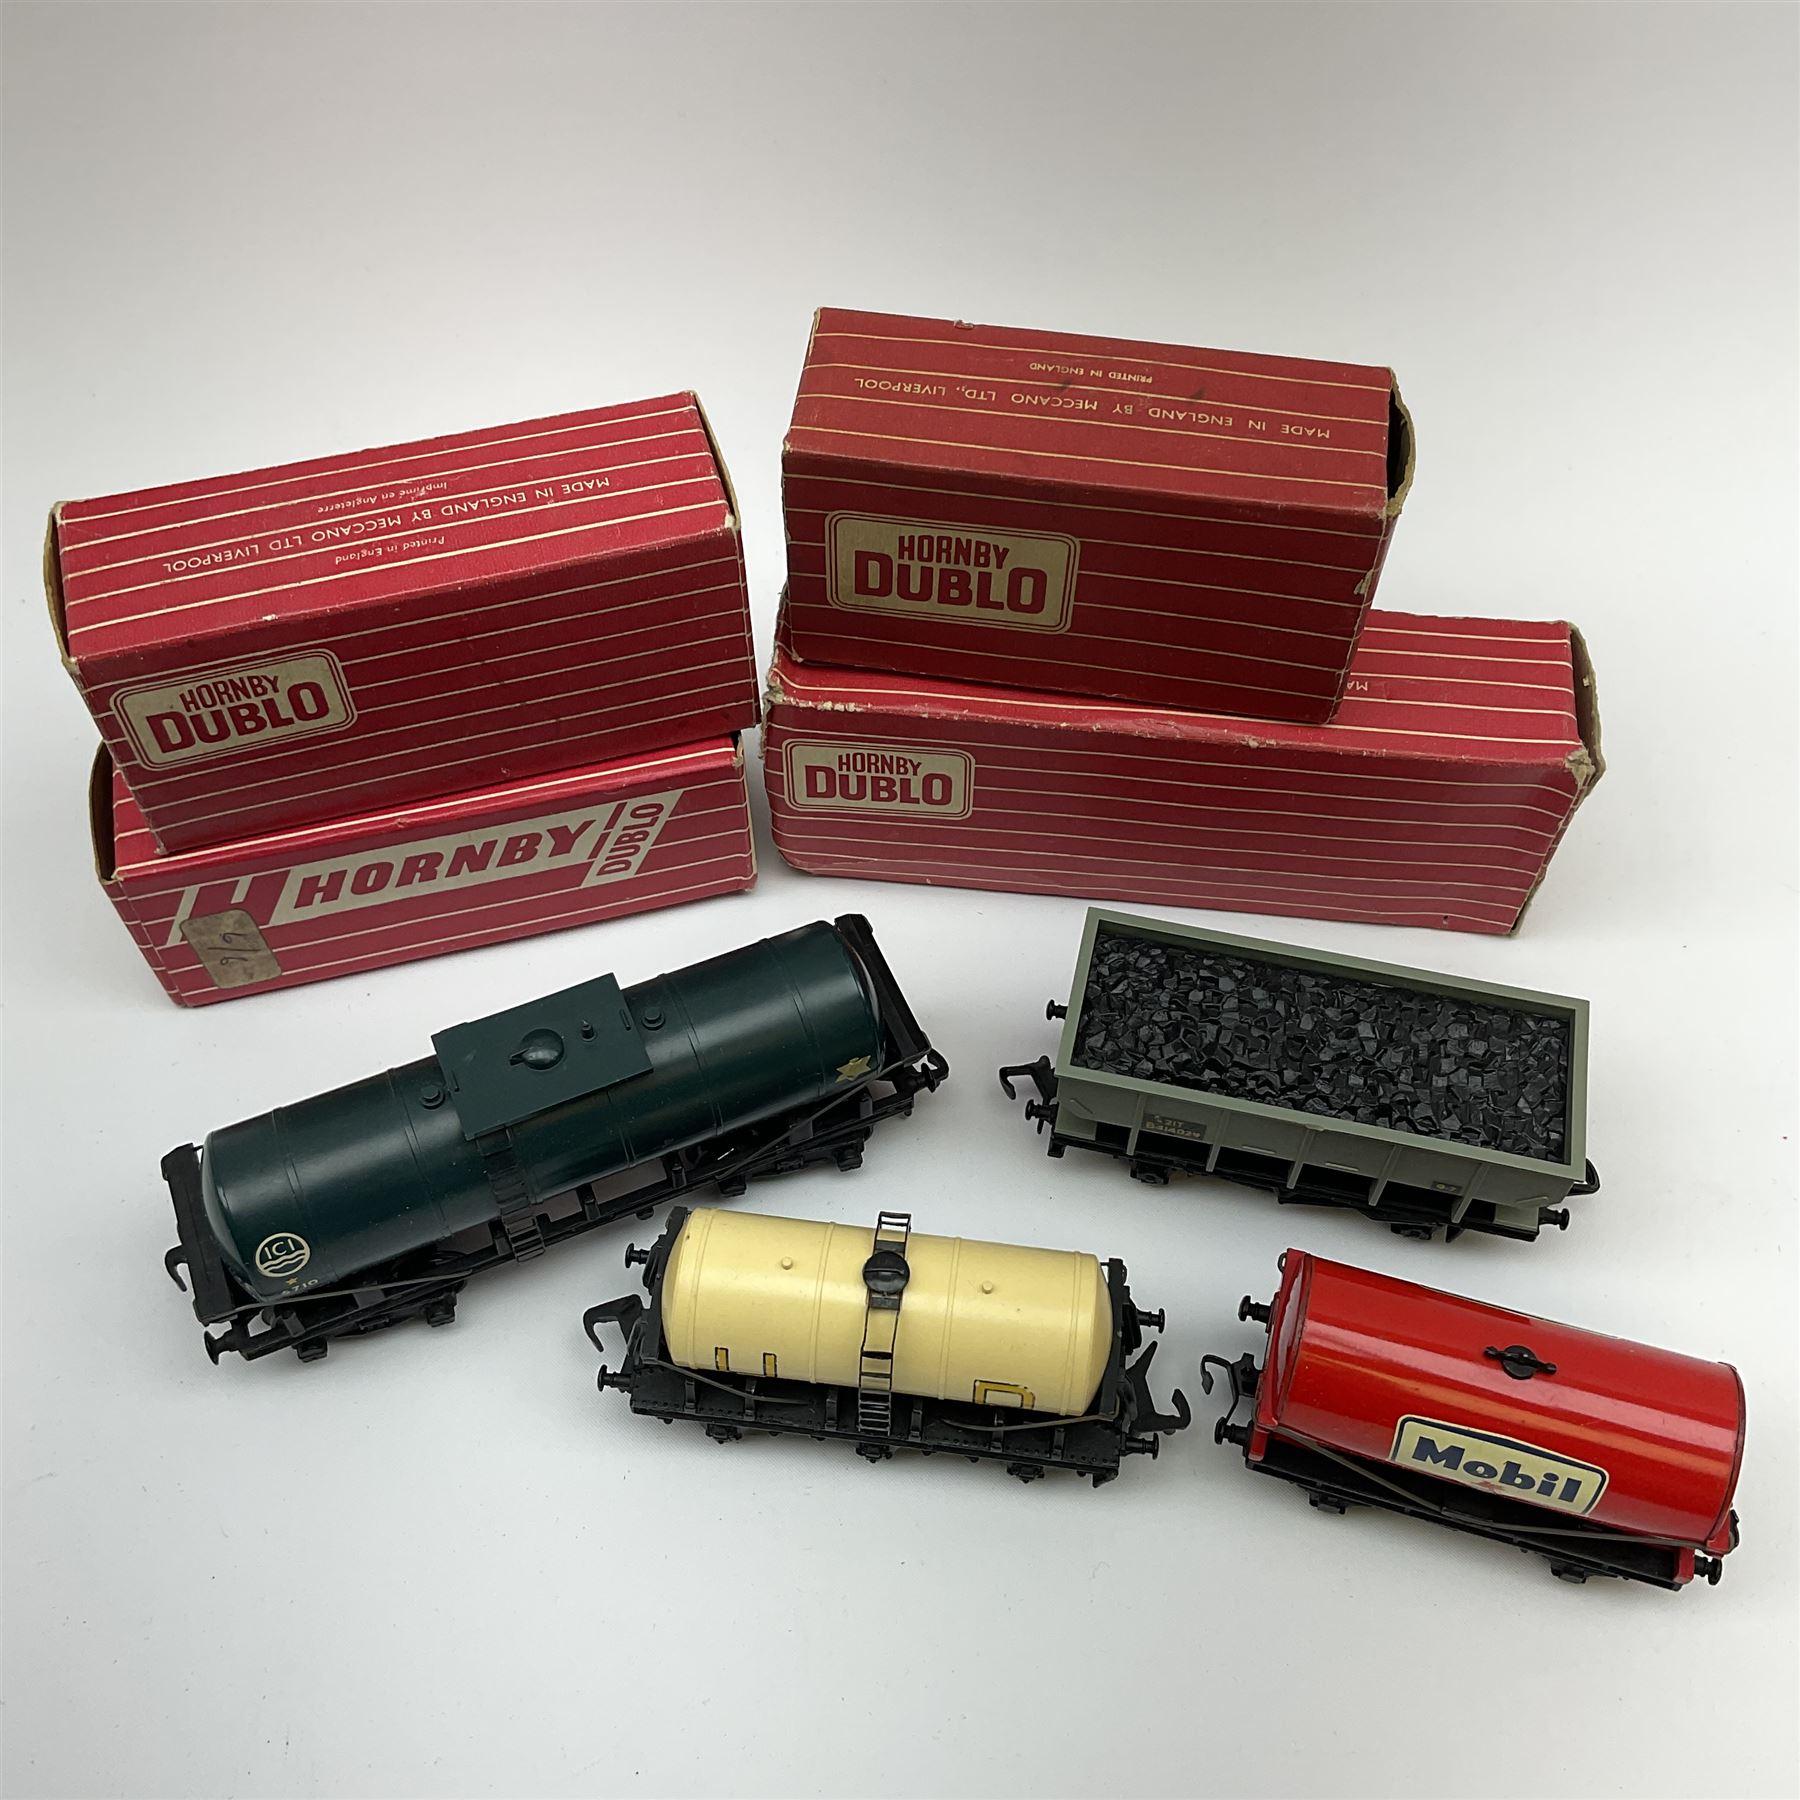 Hornby Dublo - 4685 Caustic Liquor Bogey wagon; 4644 21-Ton Hopper Wagon; 4657 'United Dairies' Milk - Image 2 of 2